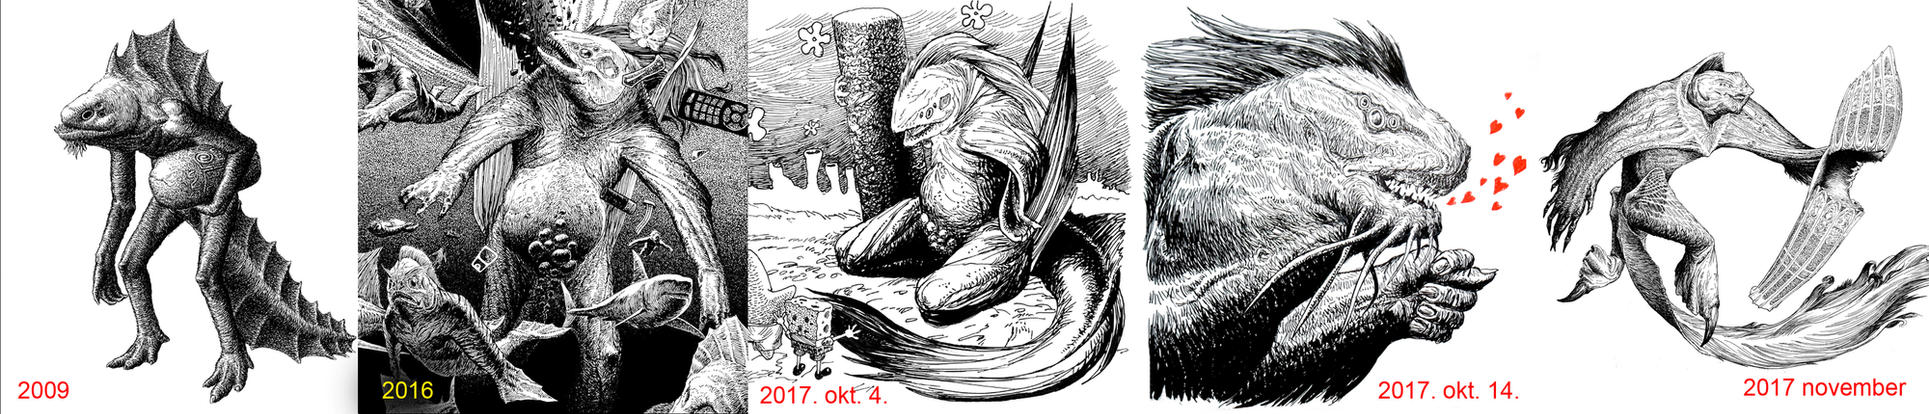 Dagonok/ Dagons by vsqs